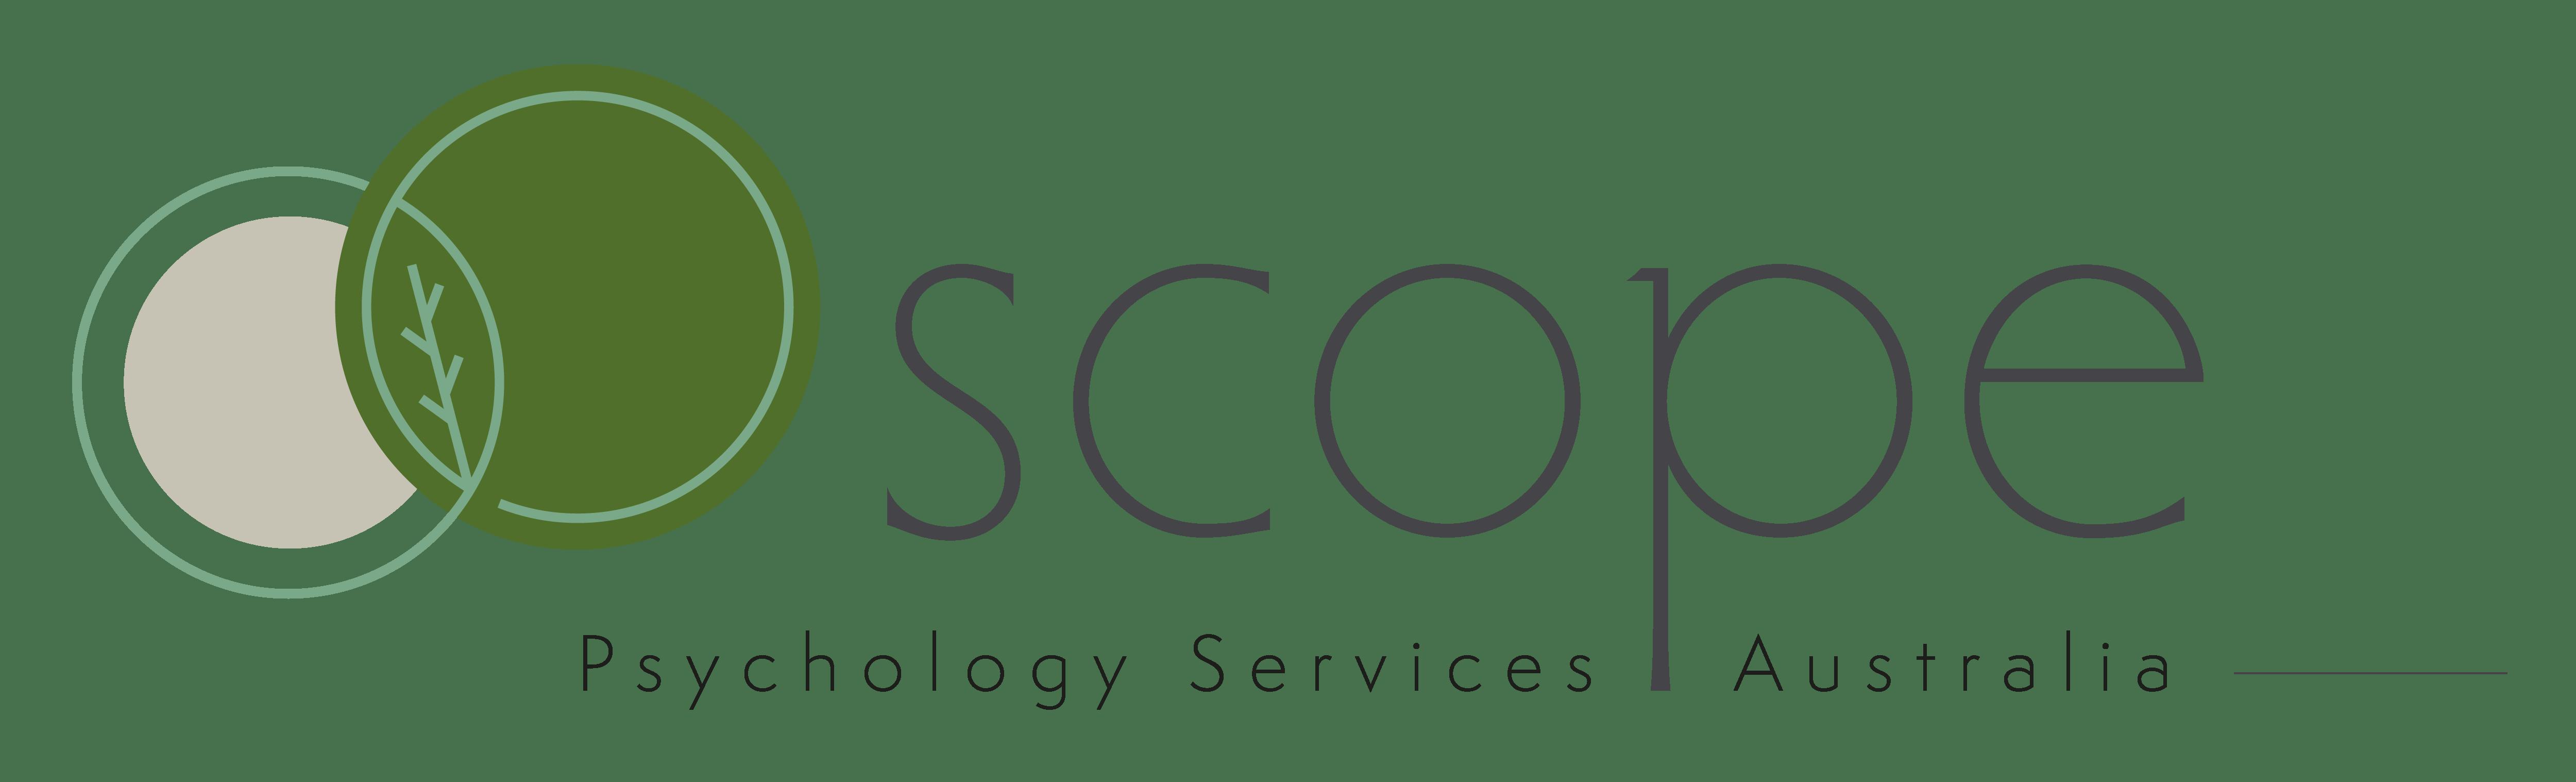 Scope Psychology Services Australia